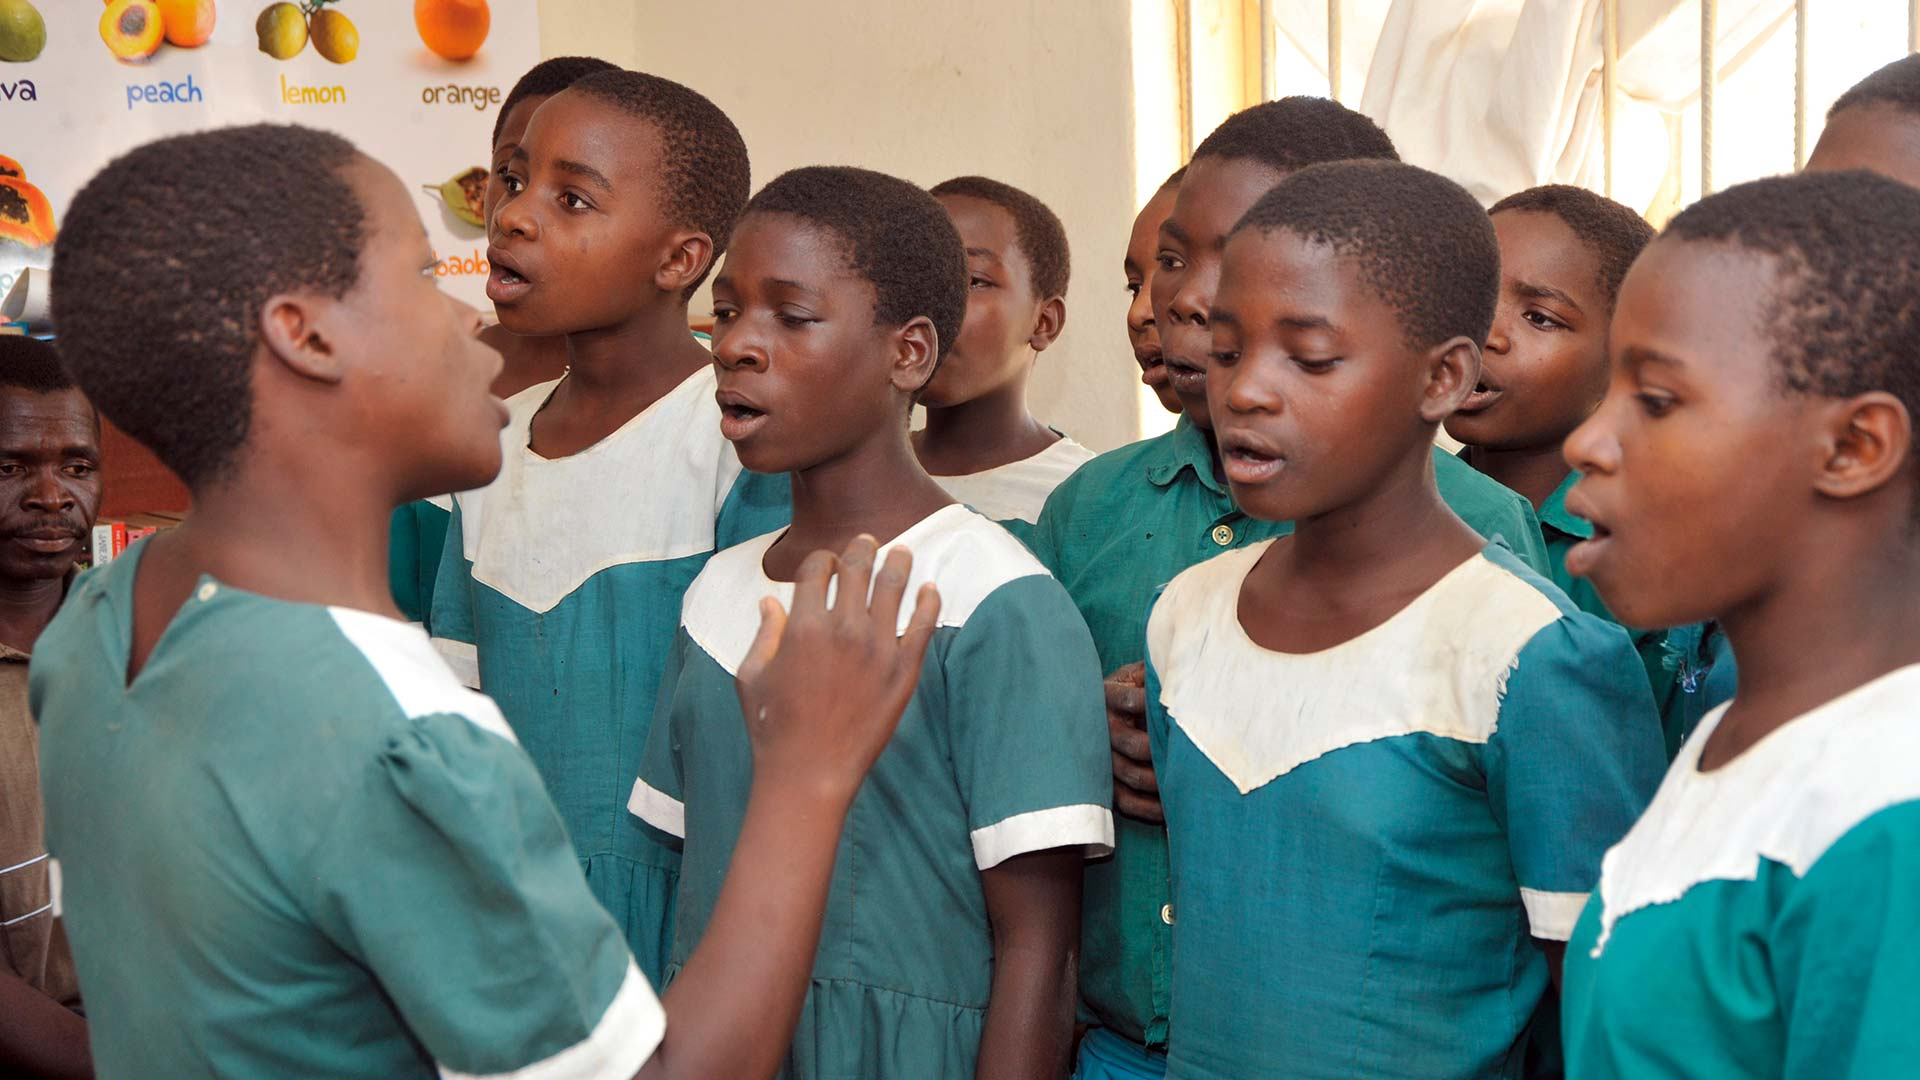 Malawian girl conducting a singing girl's choir